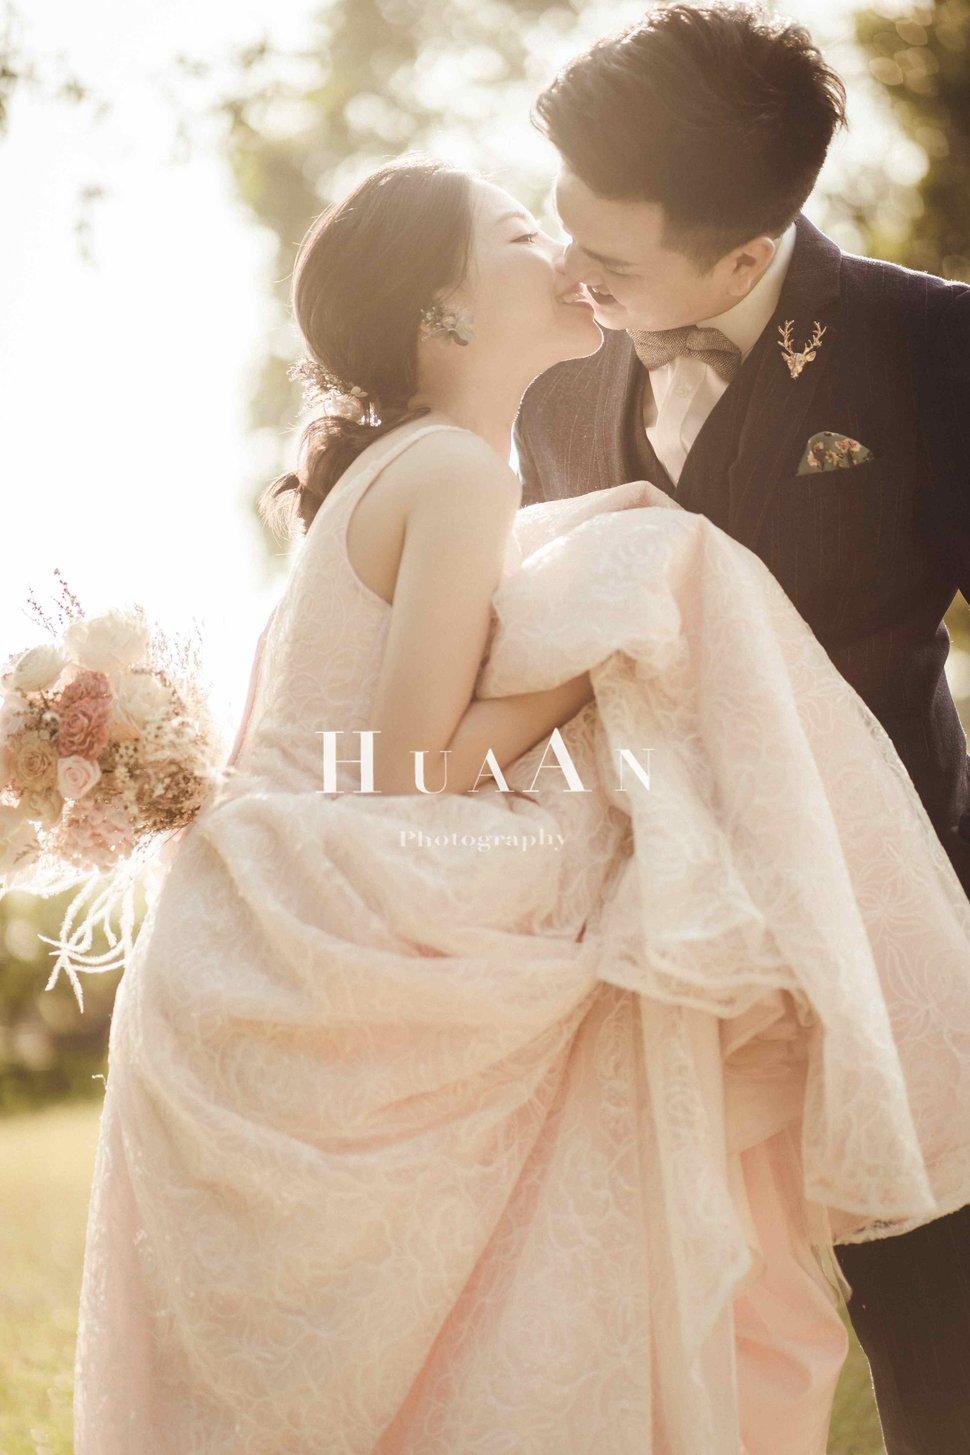 DSC04950 - Huaan Photography《結婚吧》